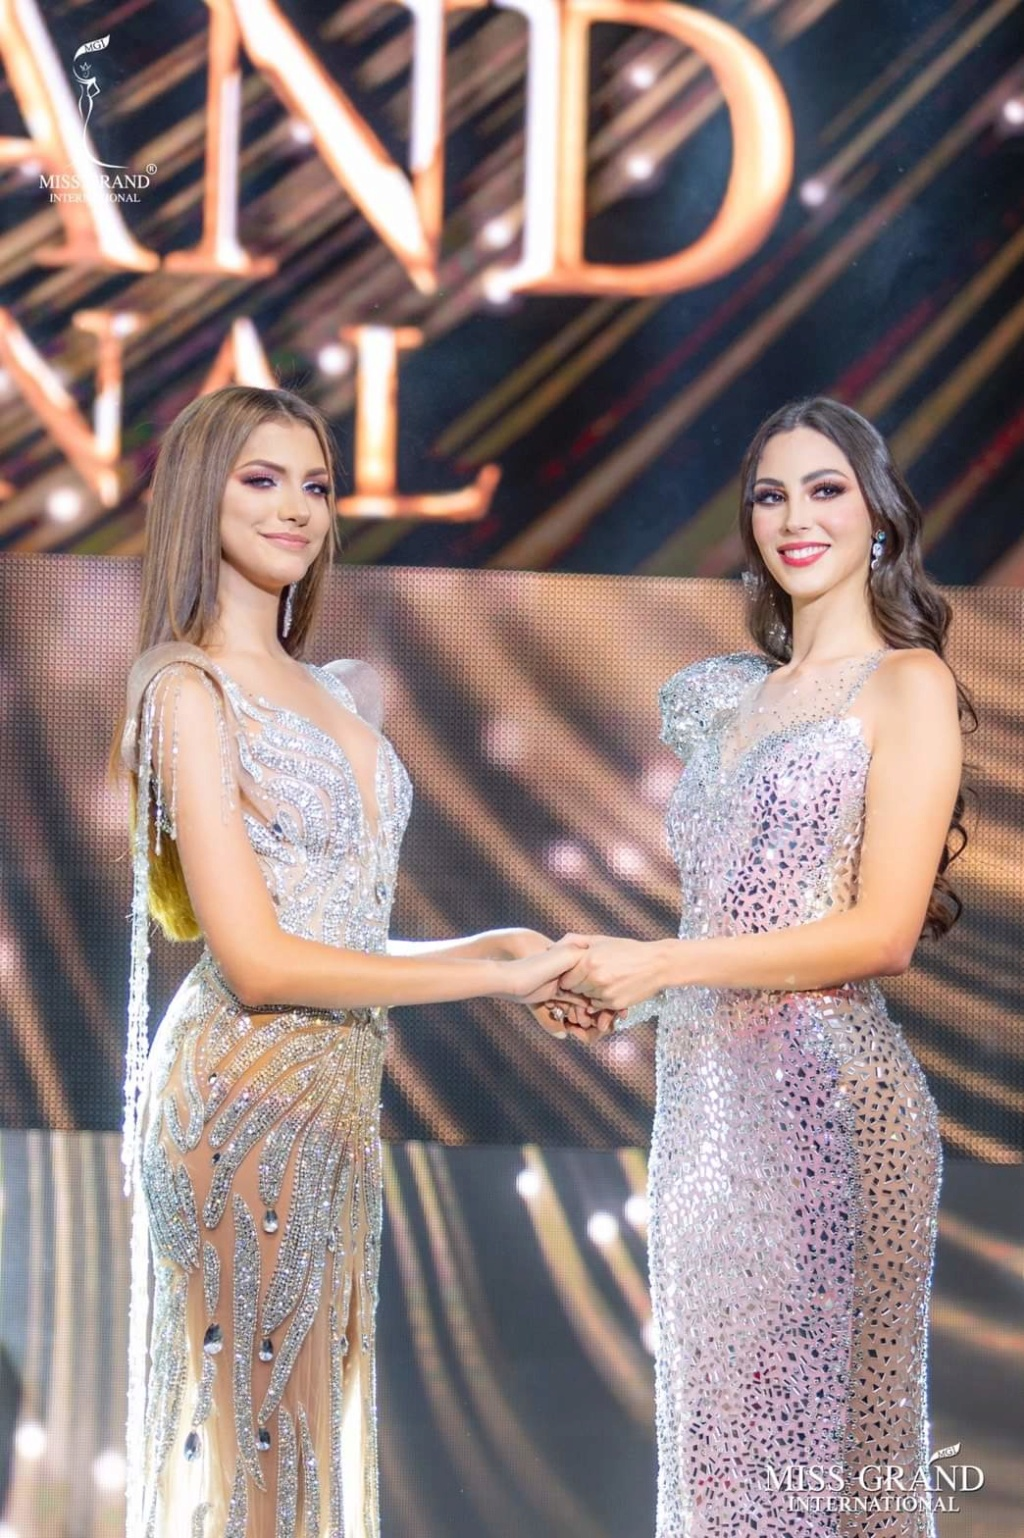 Official Thread of MISS GRAND INTERNATIONAL 2019 - Lourdes Valentina Figuera - VENEZUELA Fb_11855